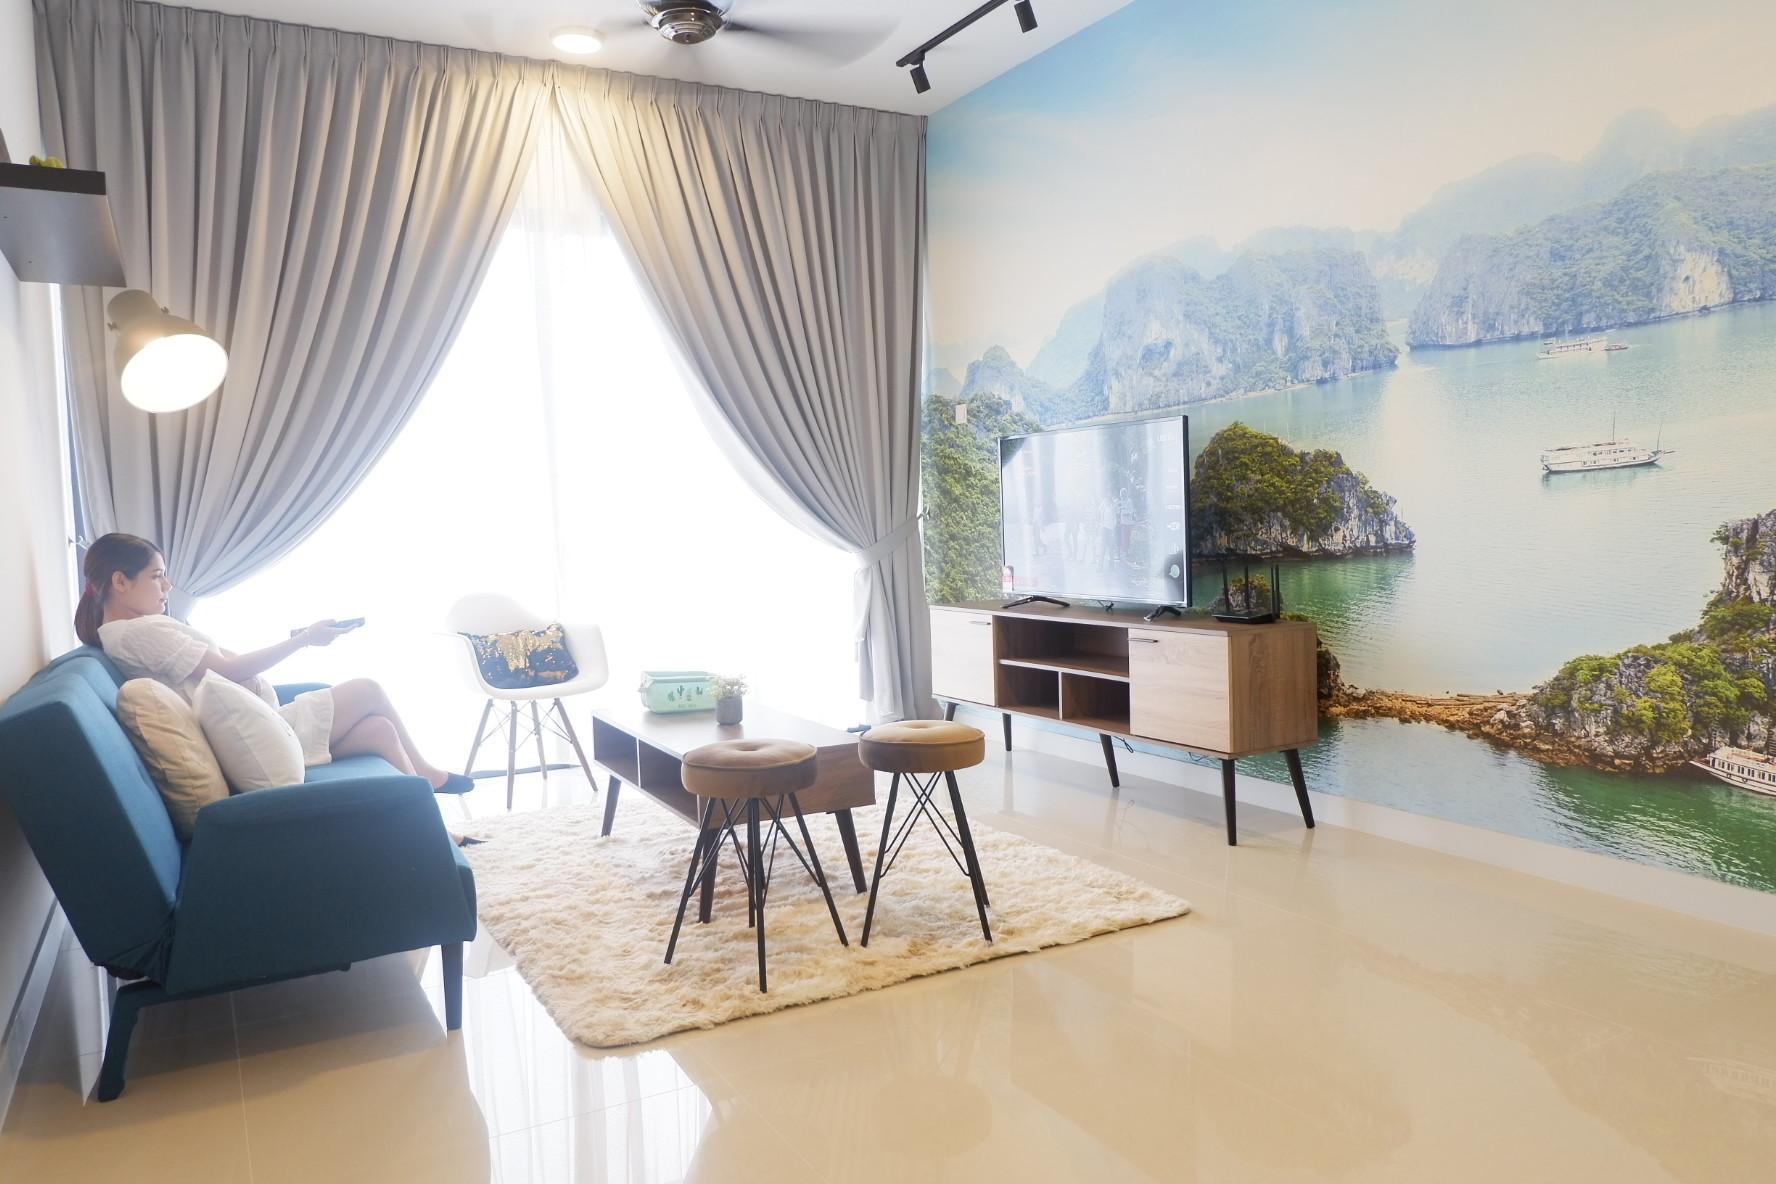 Flexiasia BayView 2 Bedroom Apartment